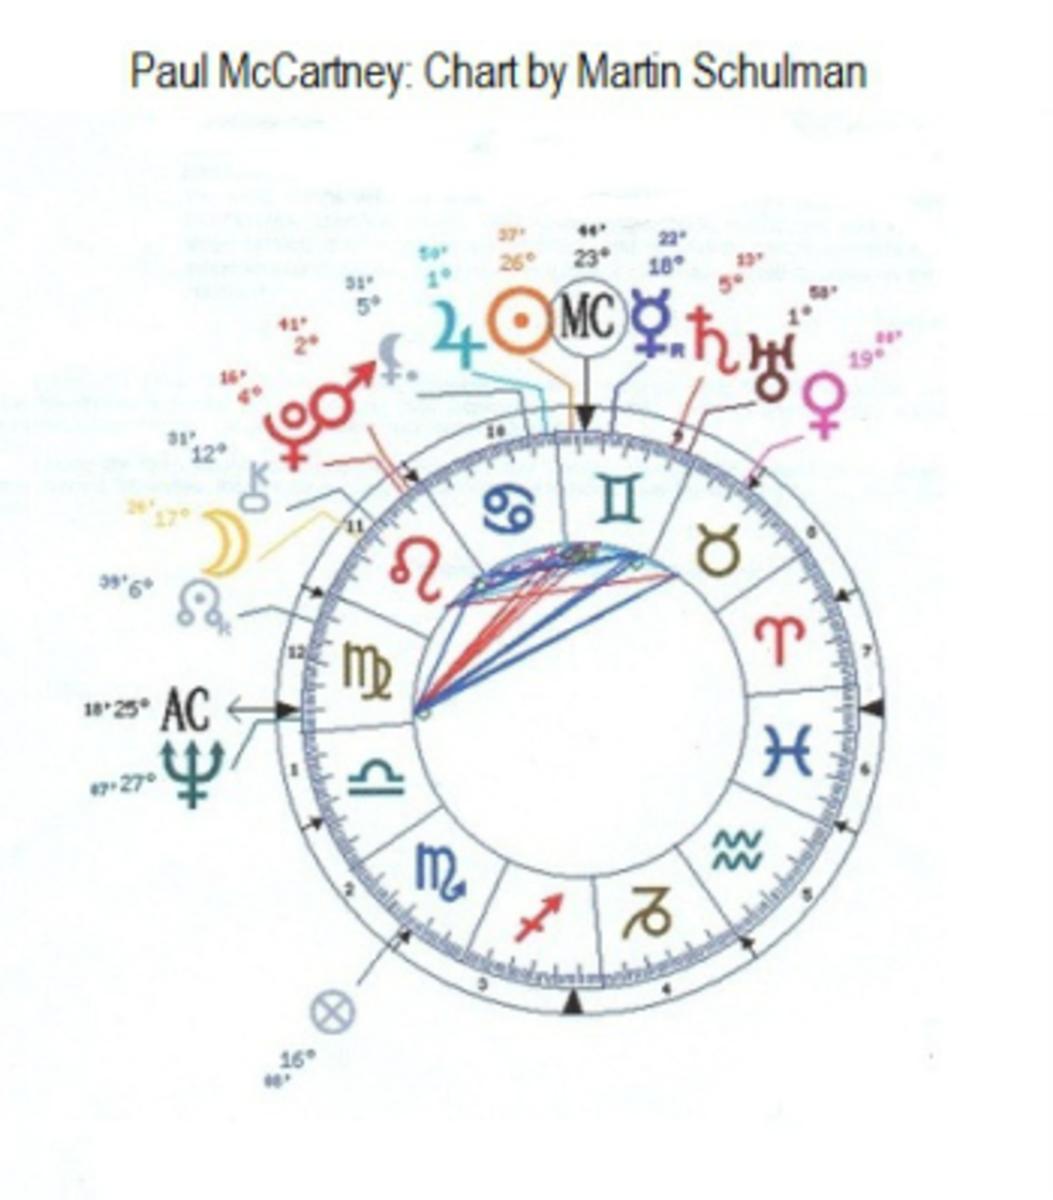 Paul McCartney's Astrology chart.